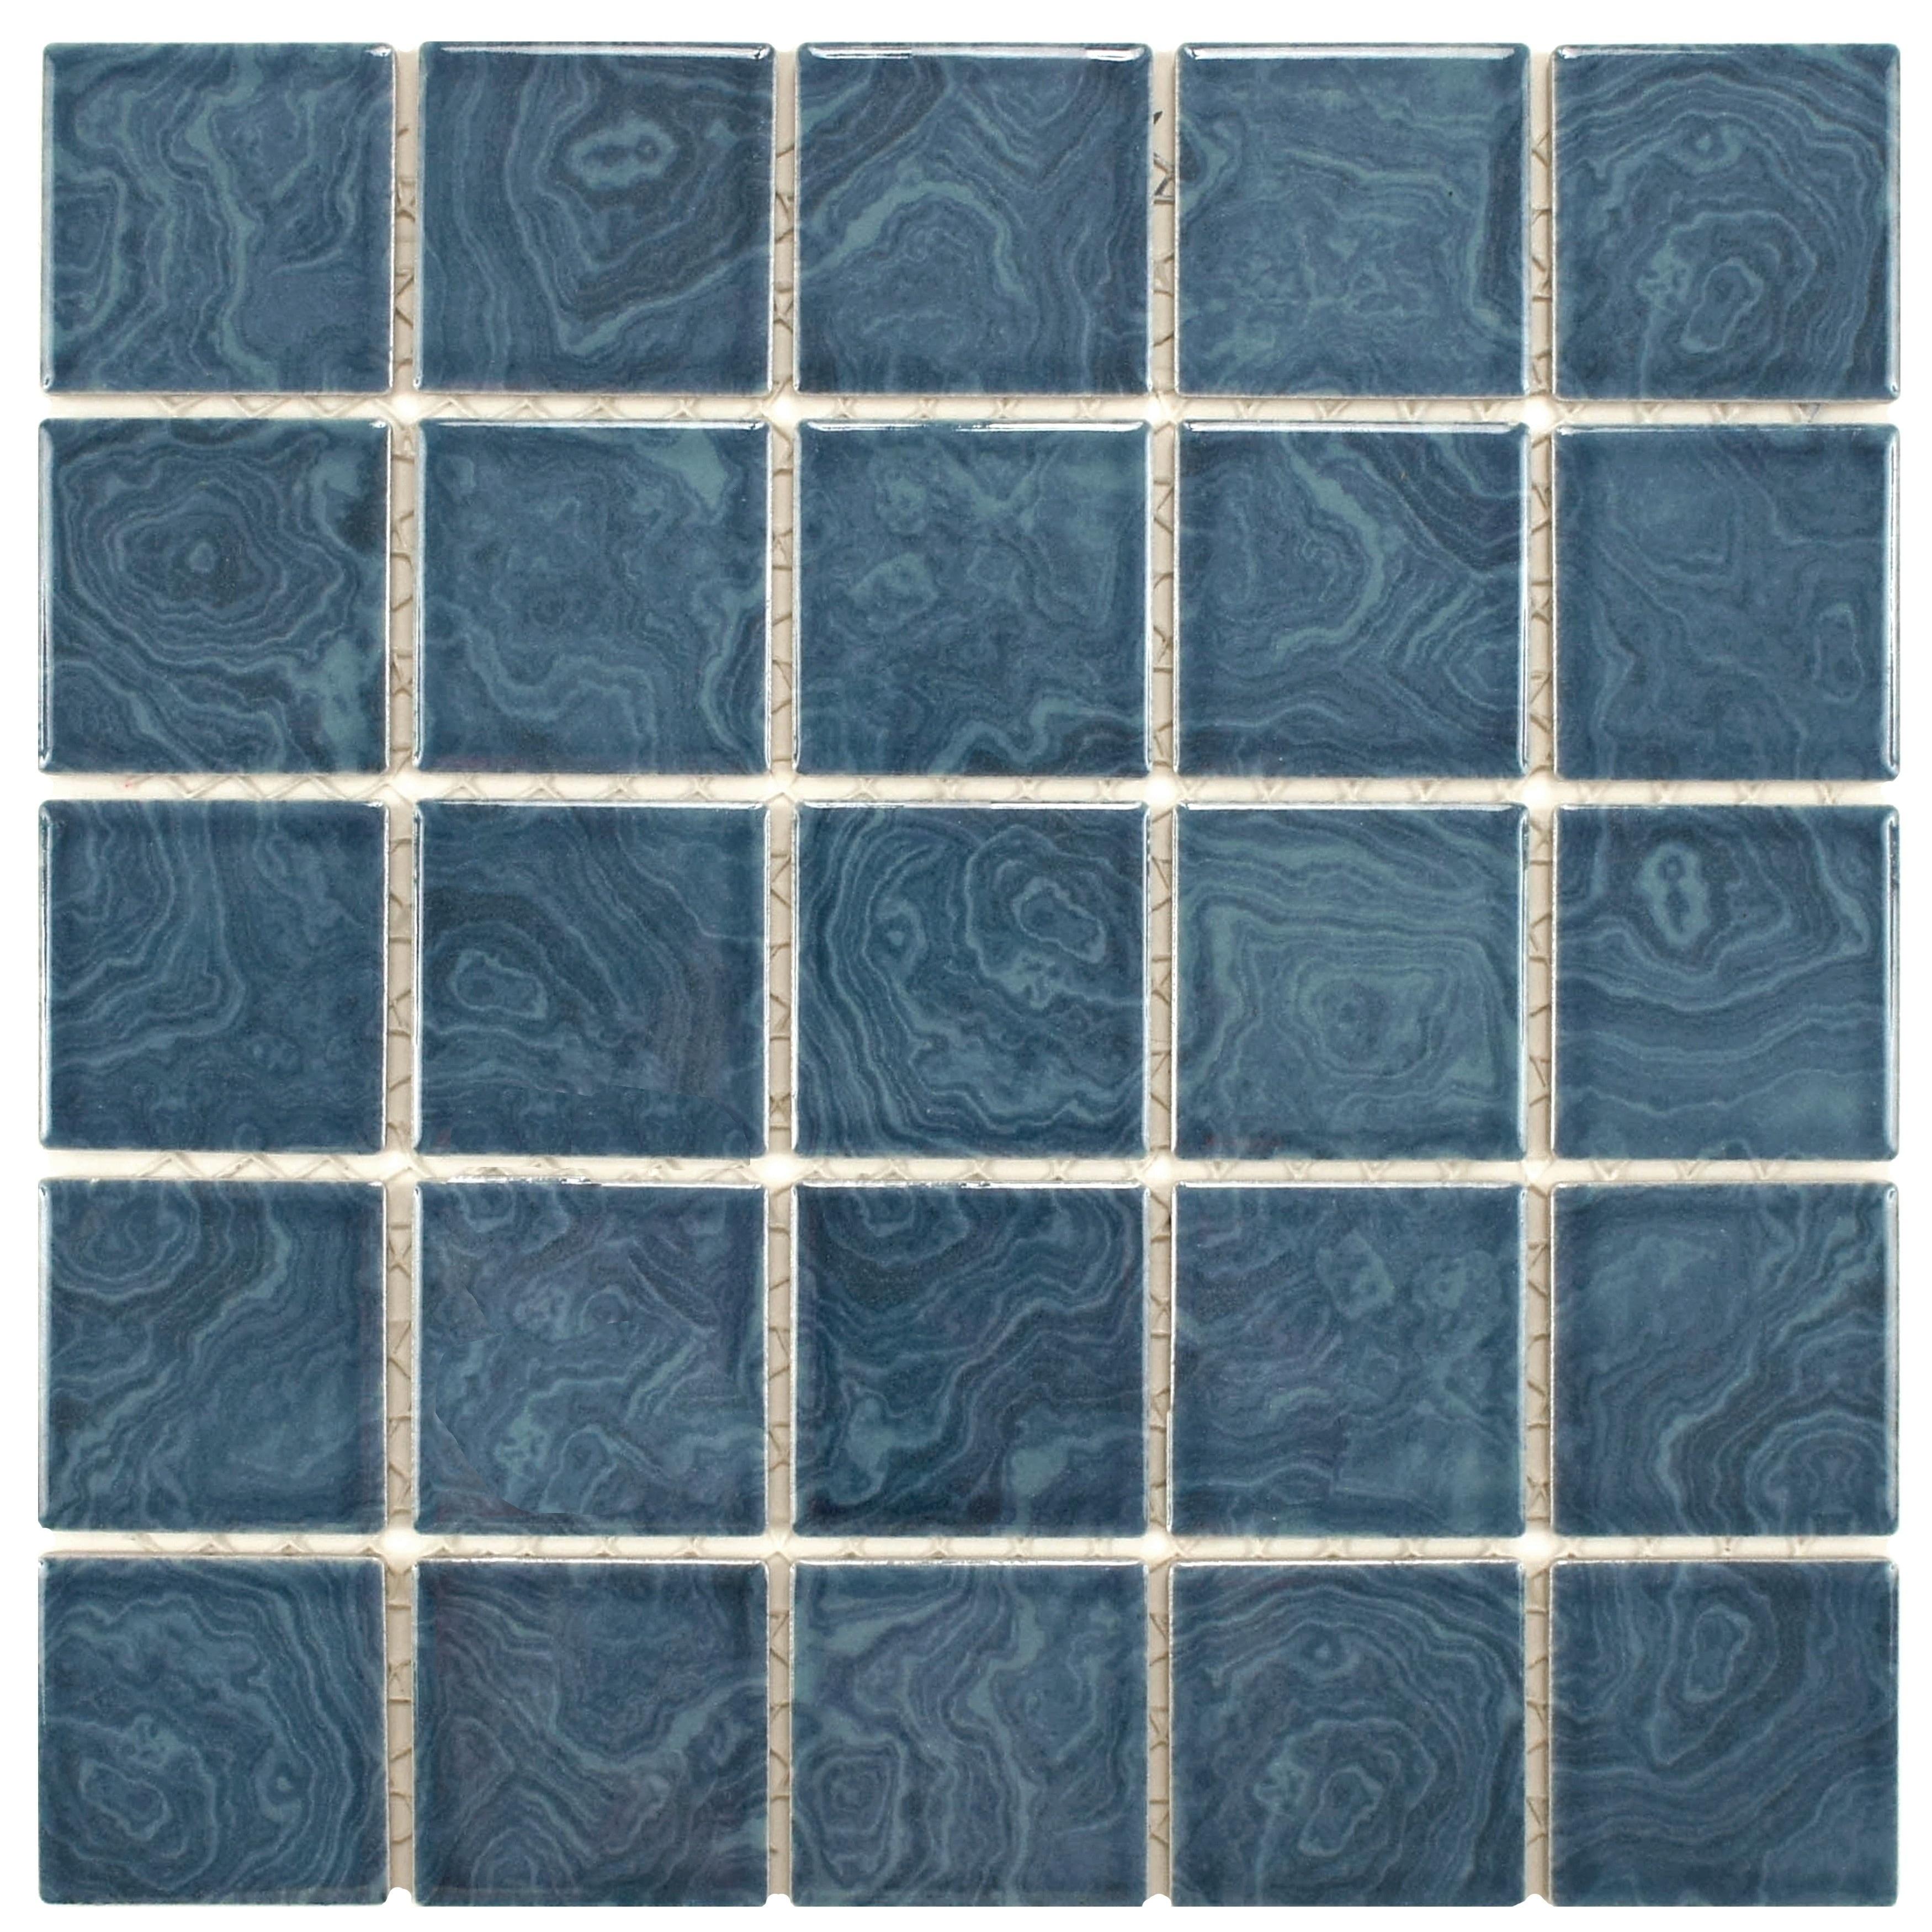 Shop SomerTile 12x12-inch Paradise Beach Blue Porcelain Mosaic Floor ...